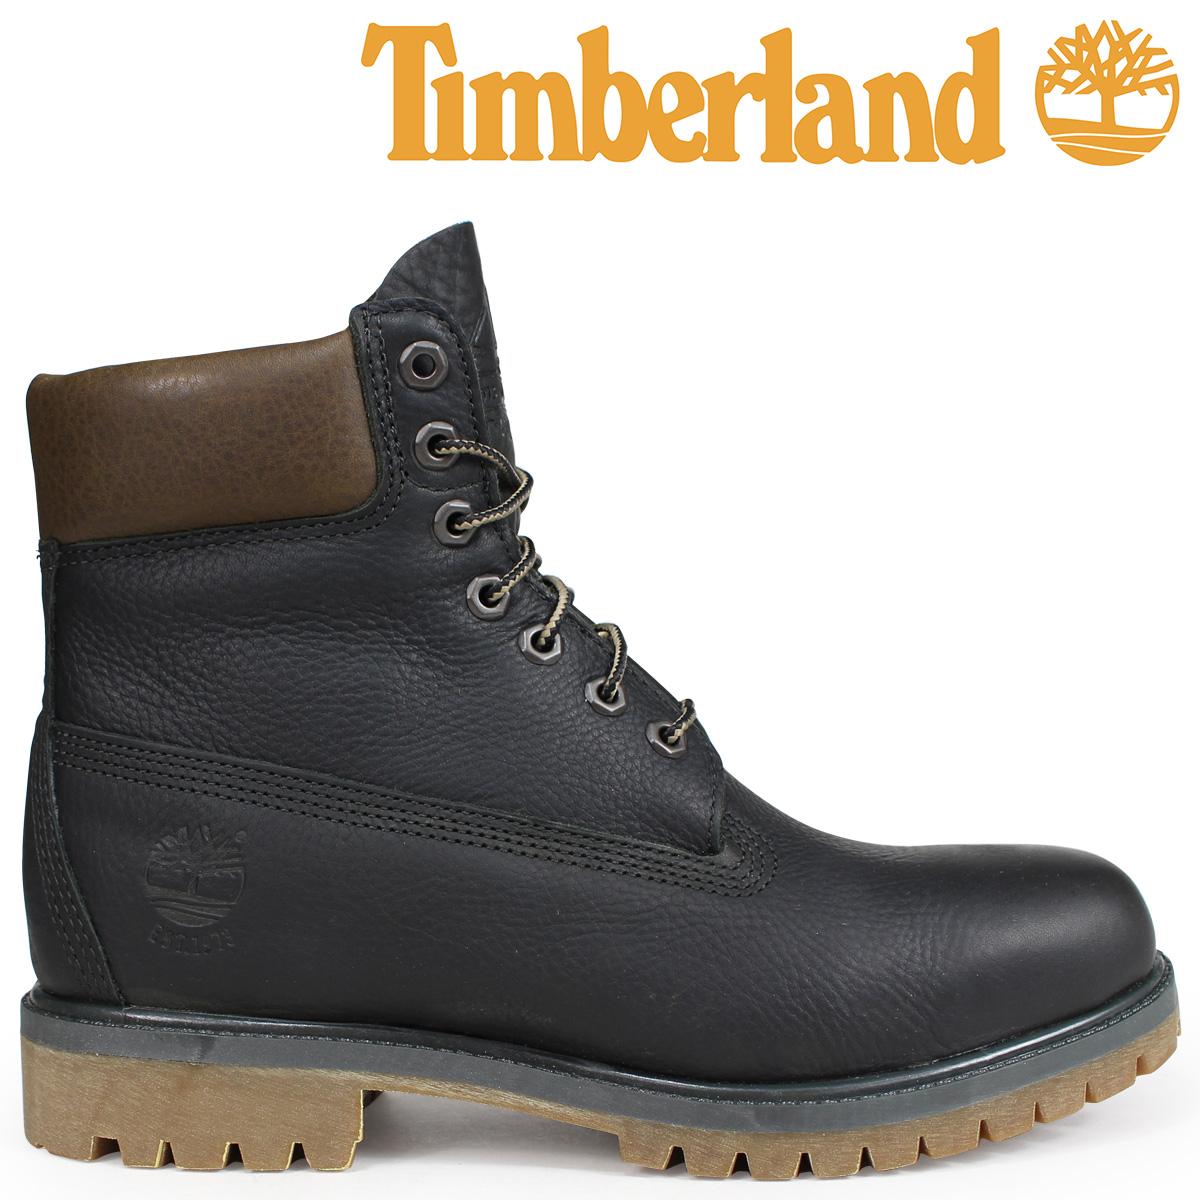 Timberland ブーツ メンズ 6インチ ティンバーランド HERITAGE 6-INCH PREMIUM BOOTS A1R1A Wワイズ ダークグレー